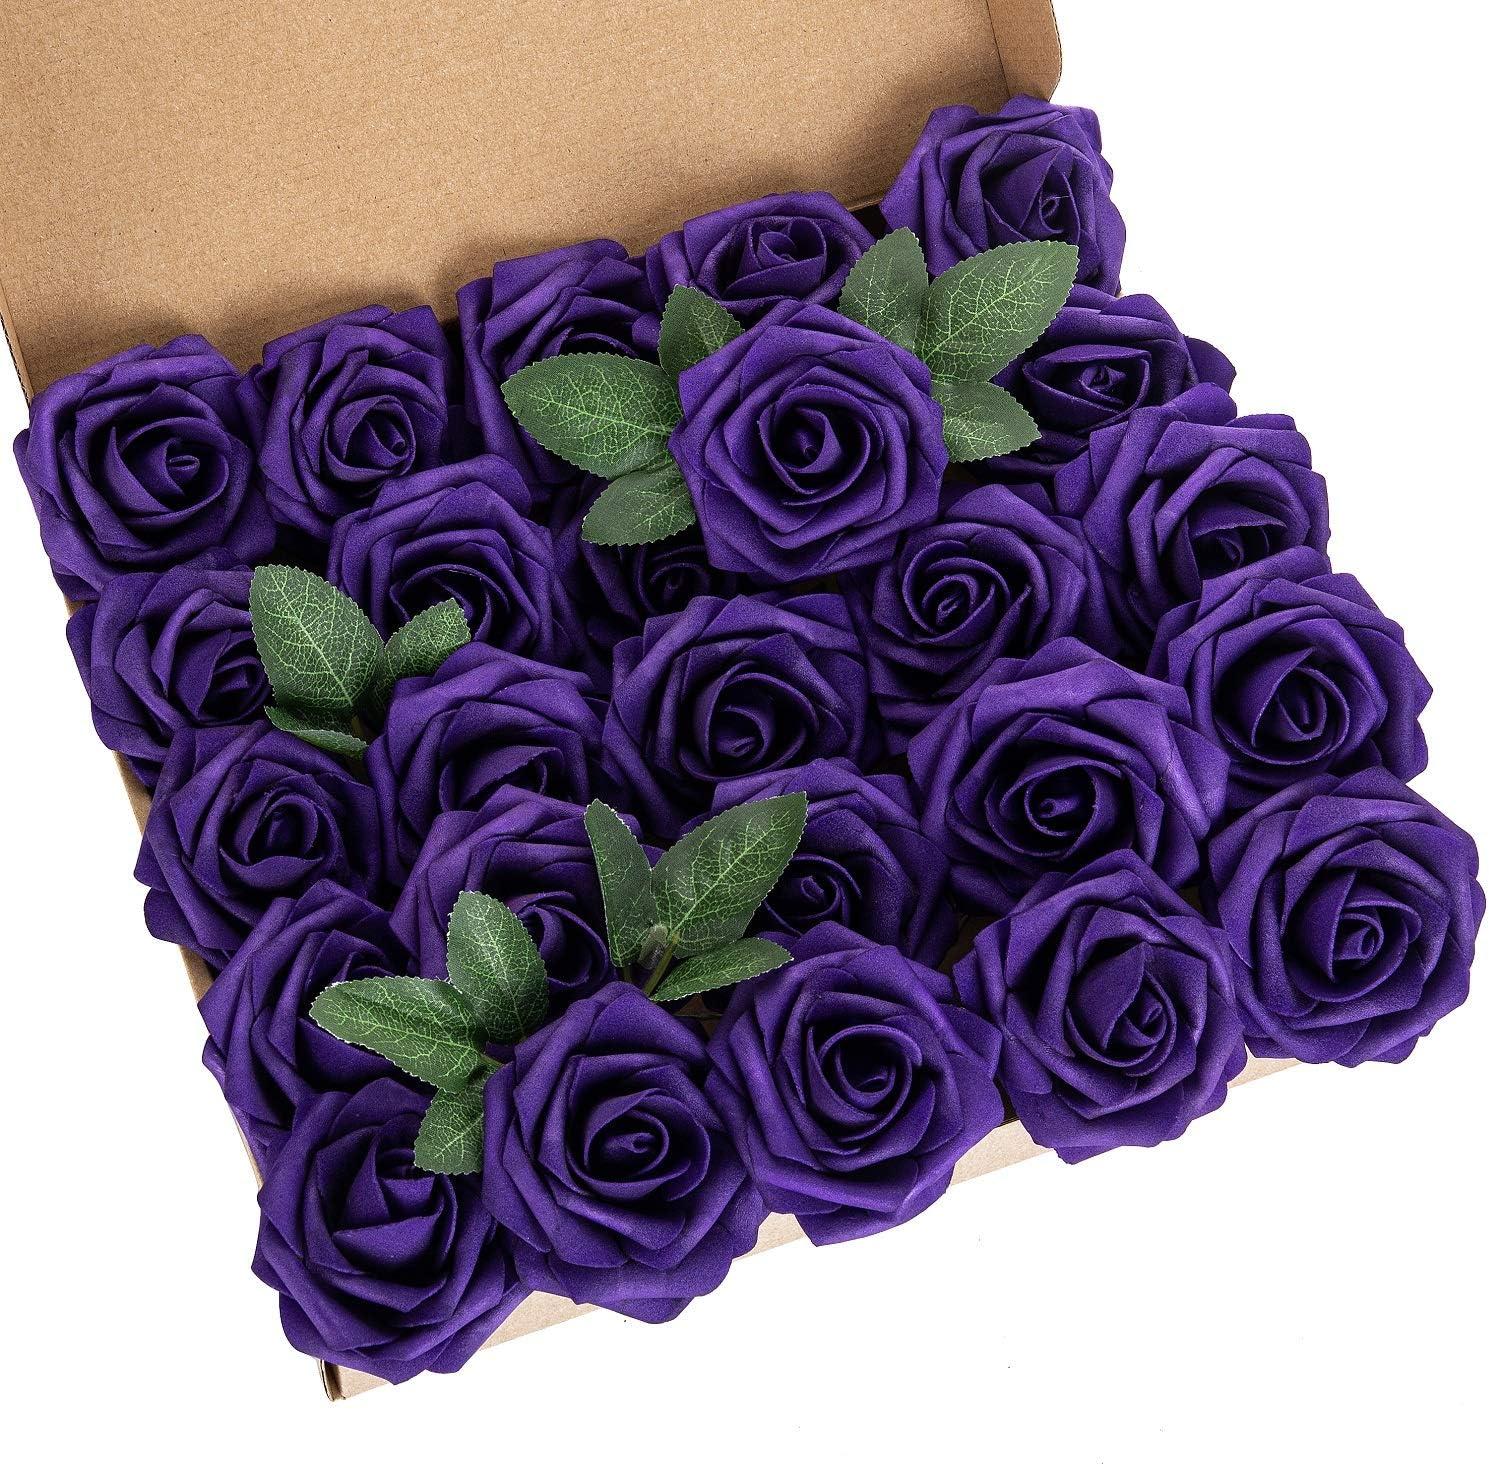 Exoment 25pcs Artificial Flower Genuine Phoenix Mall Foam Rose Real Touch Purple